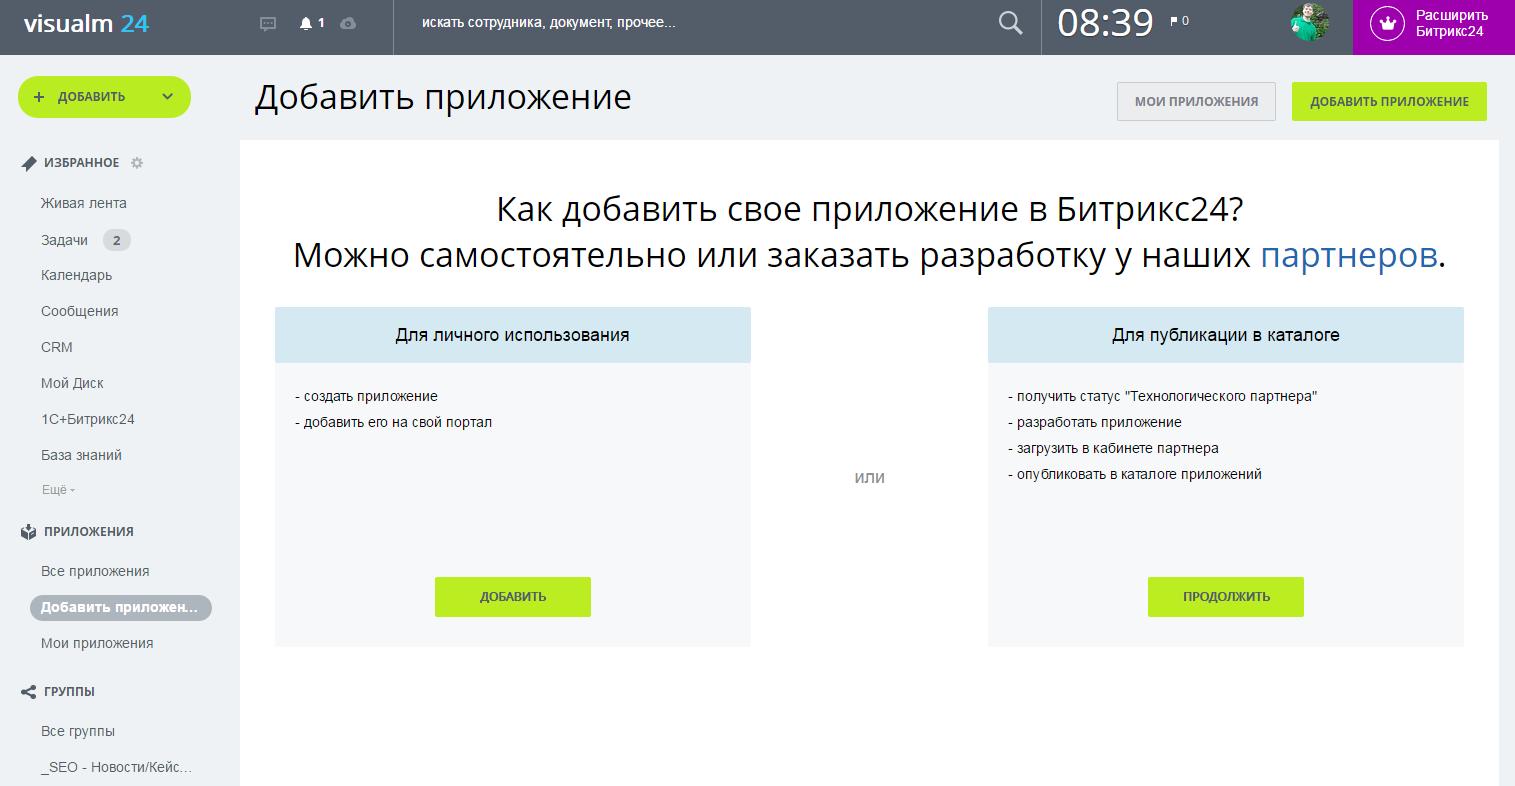 Битрикс24 разработка приложения обмен данными между битрикс и 1с